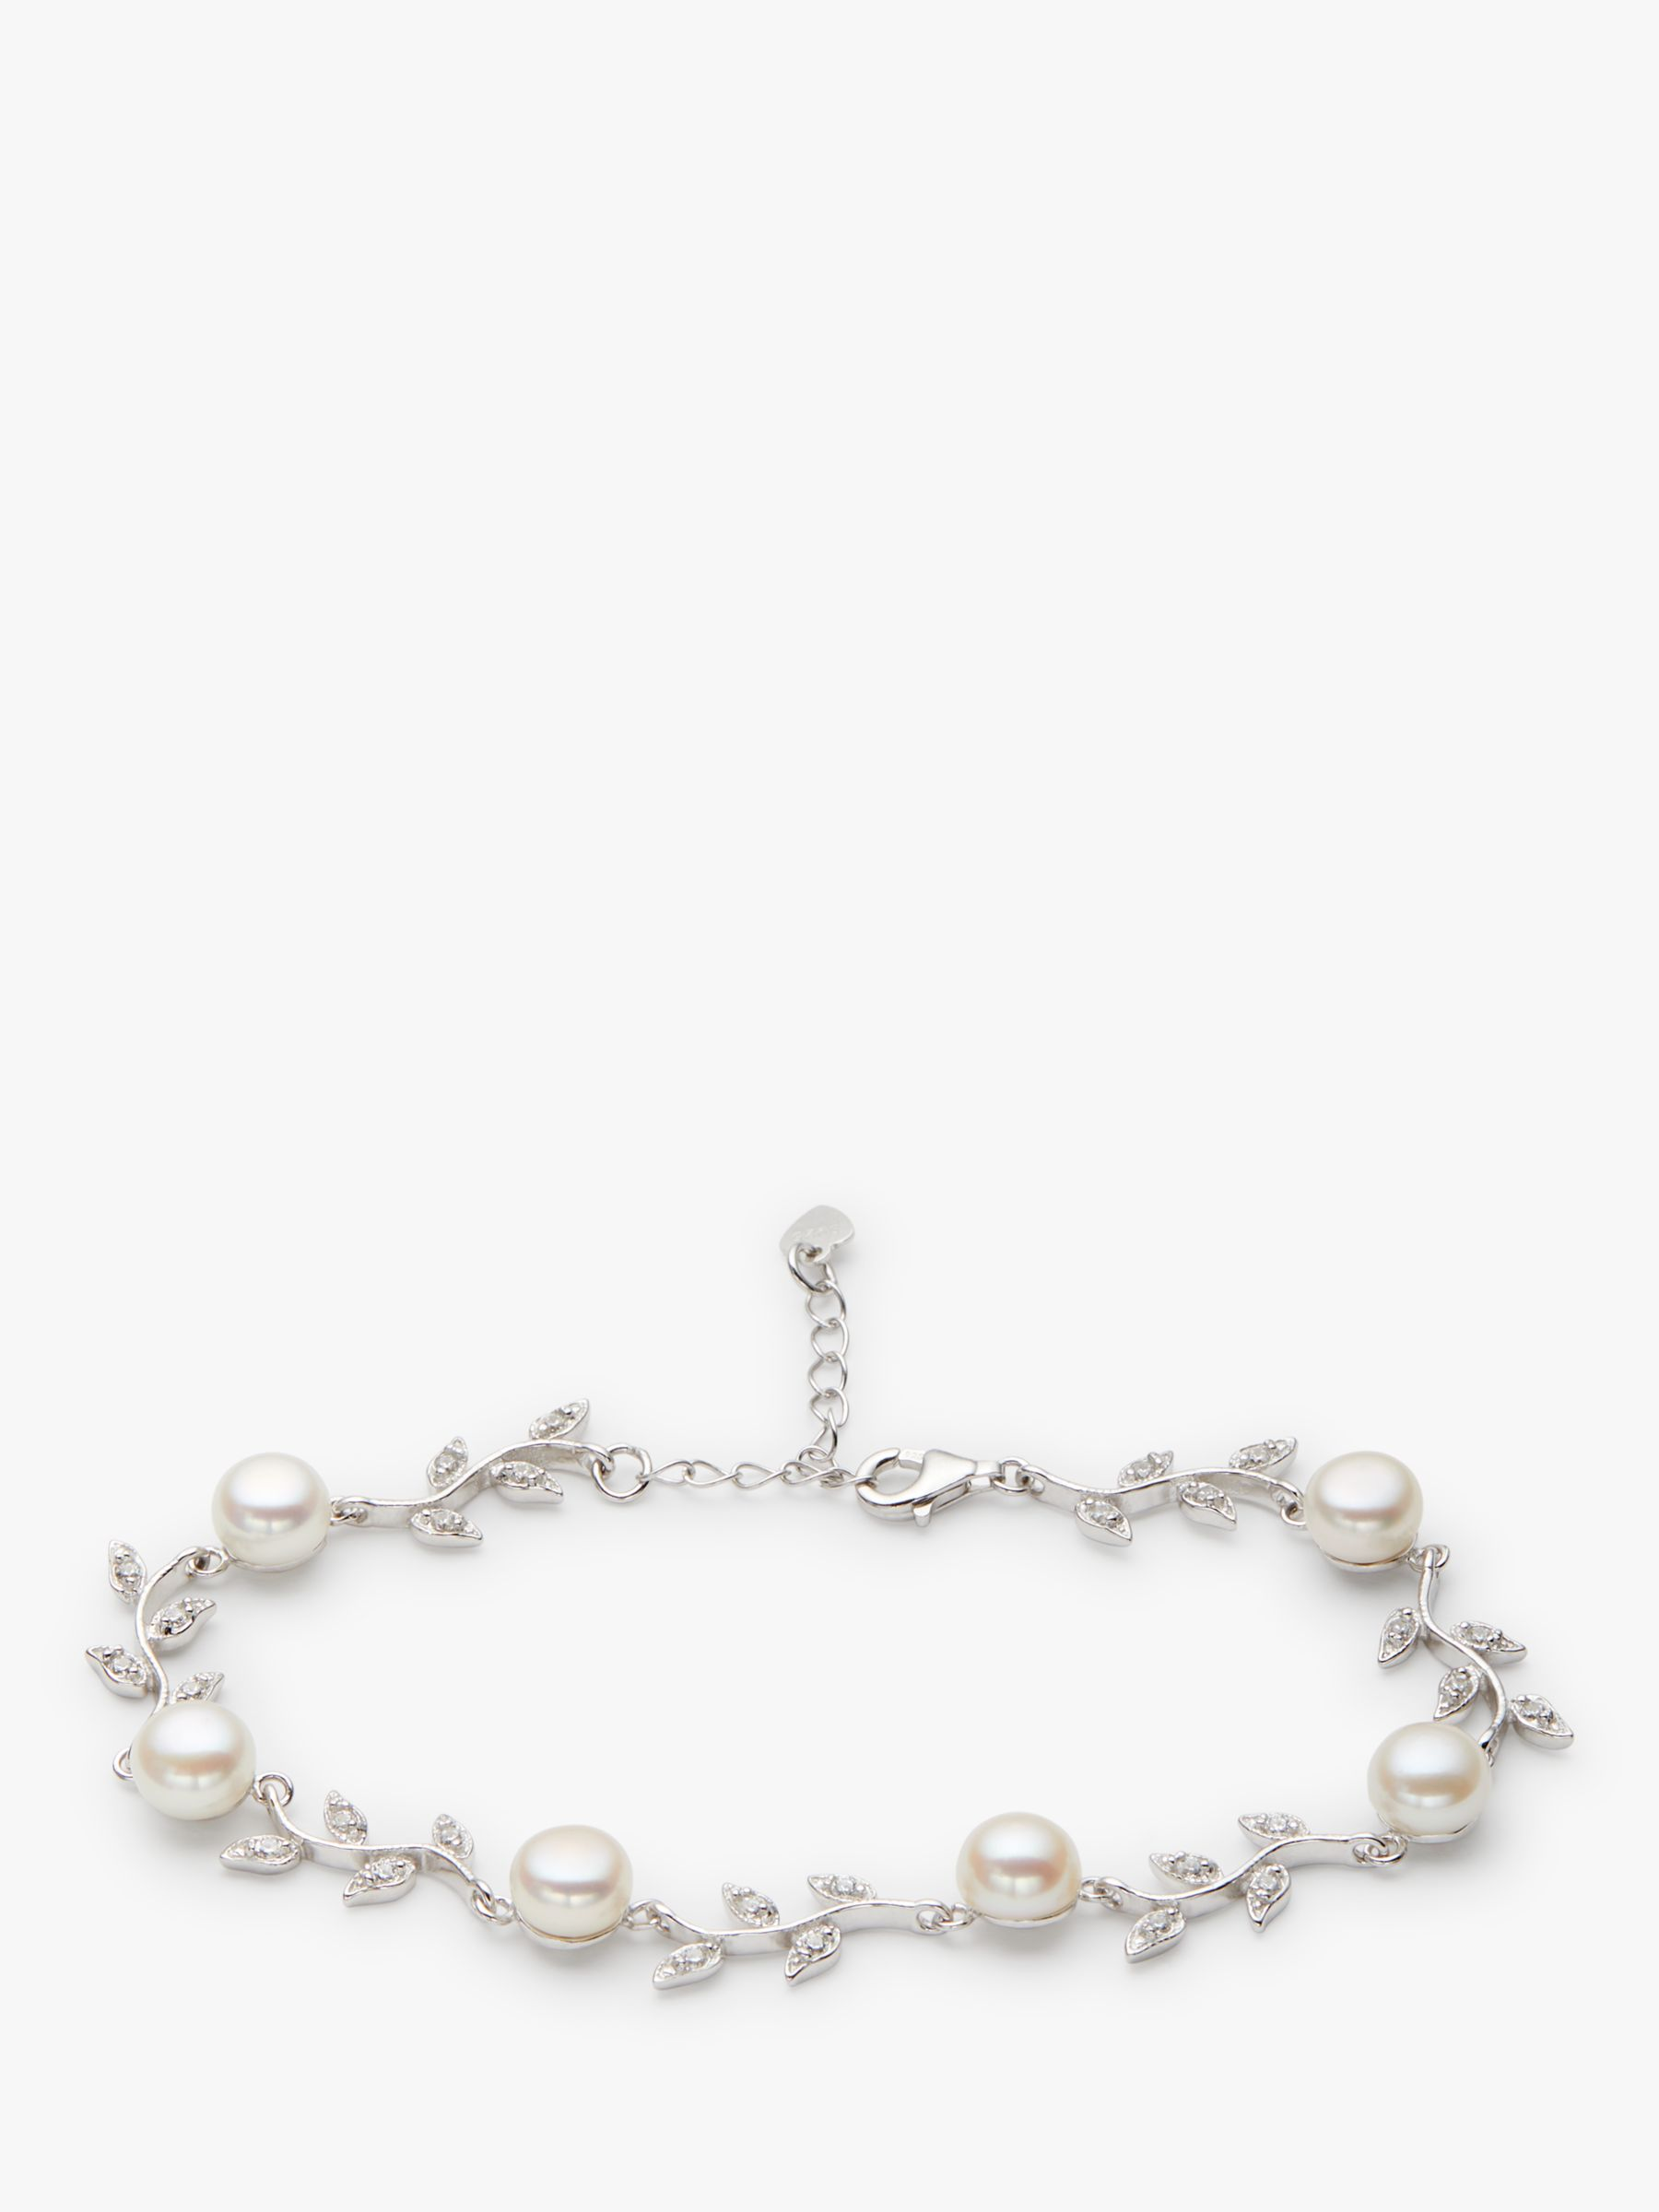 Lido Pearls Lido Pearls Leaf Pearl Bracelet, Silver/White